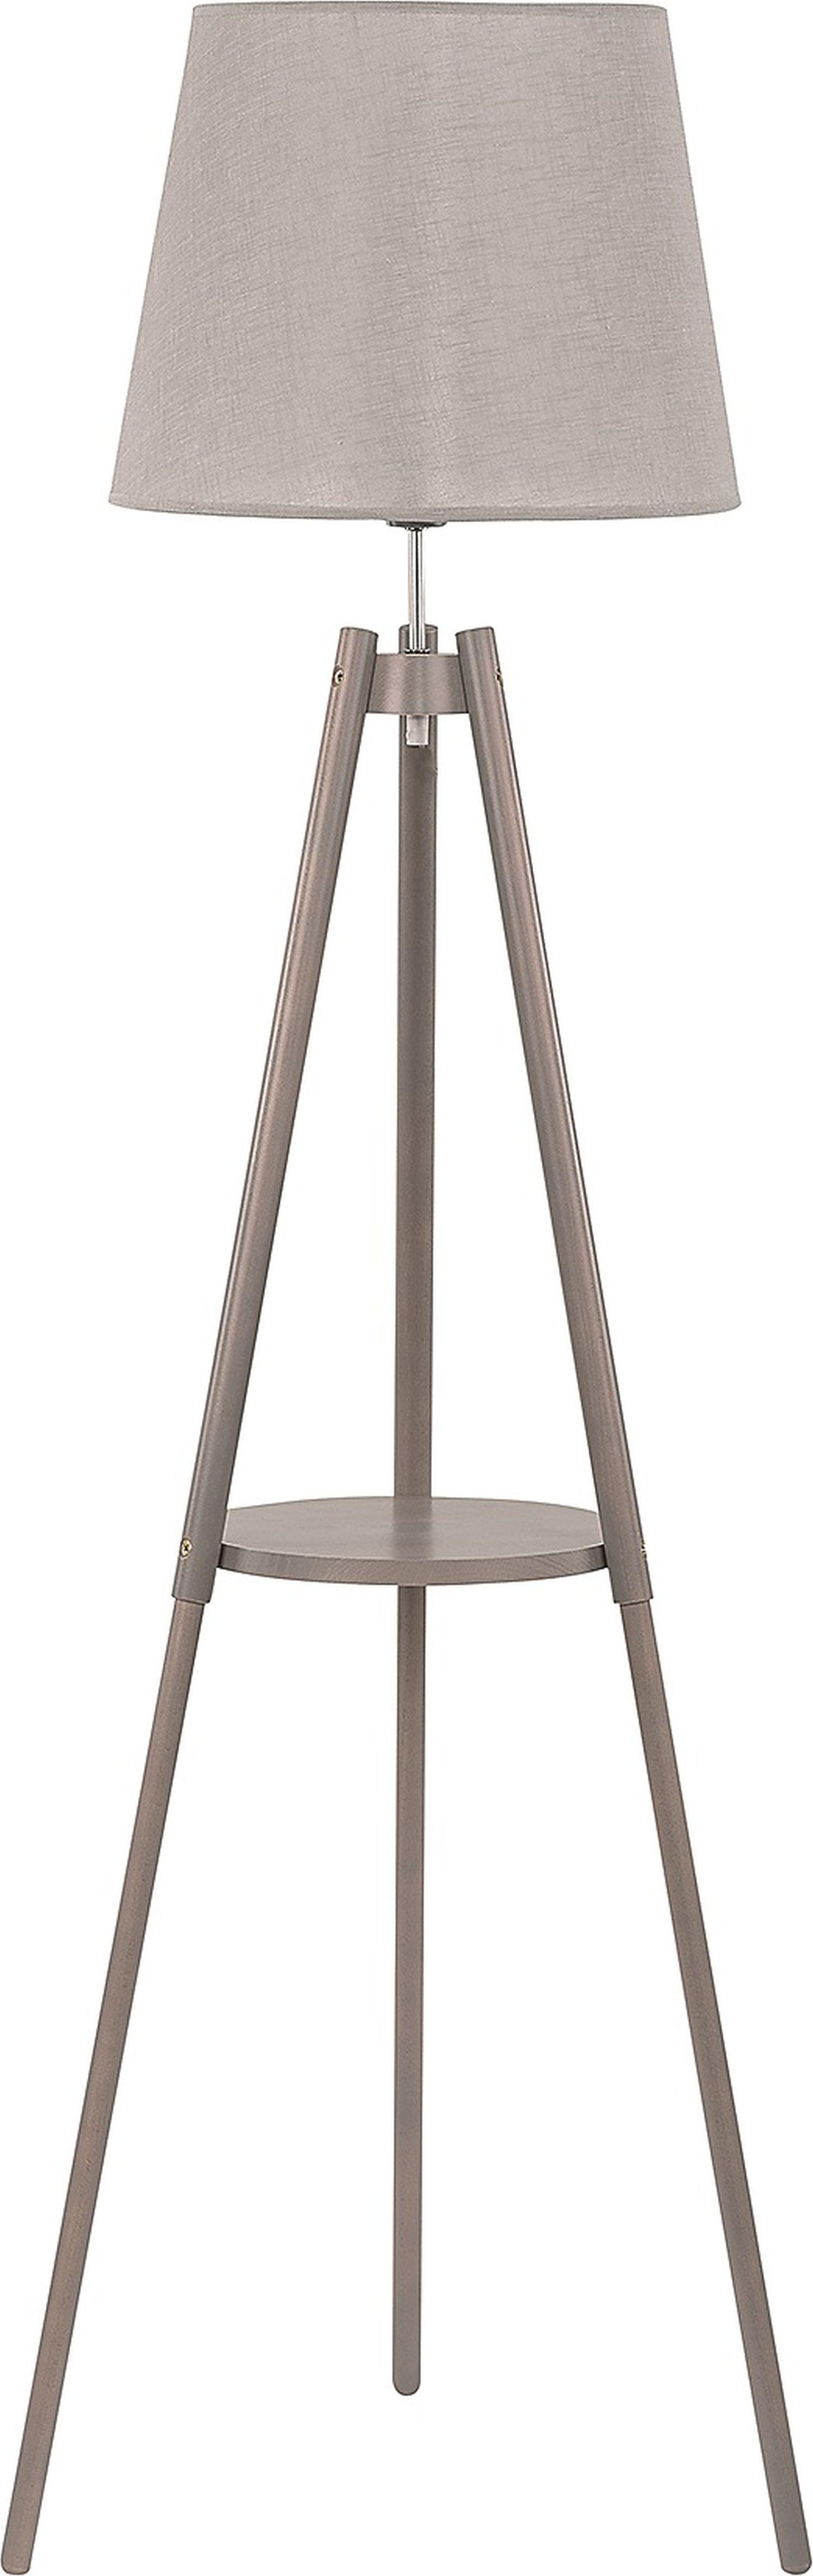 Standleuchte Lozano Grau Holz